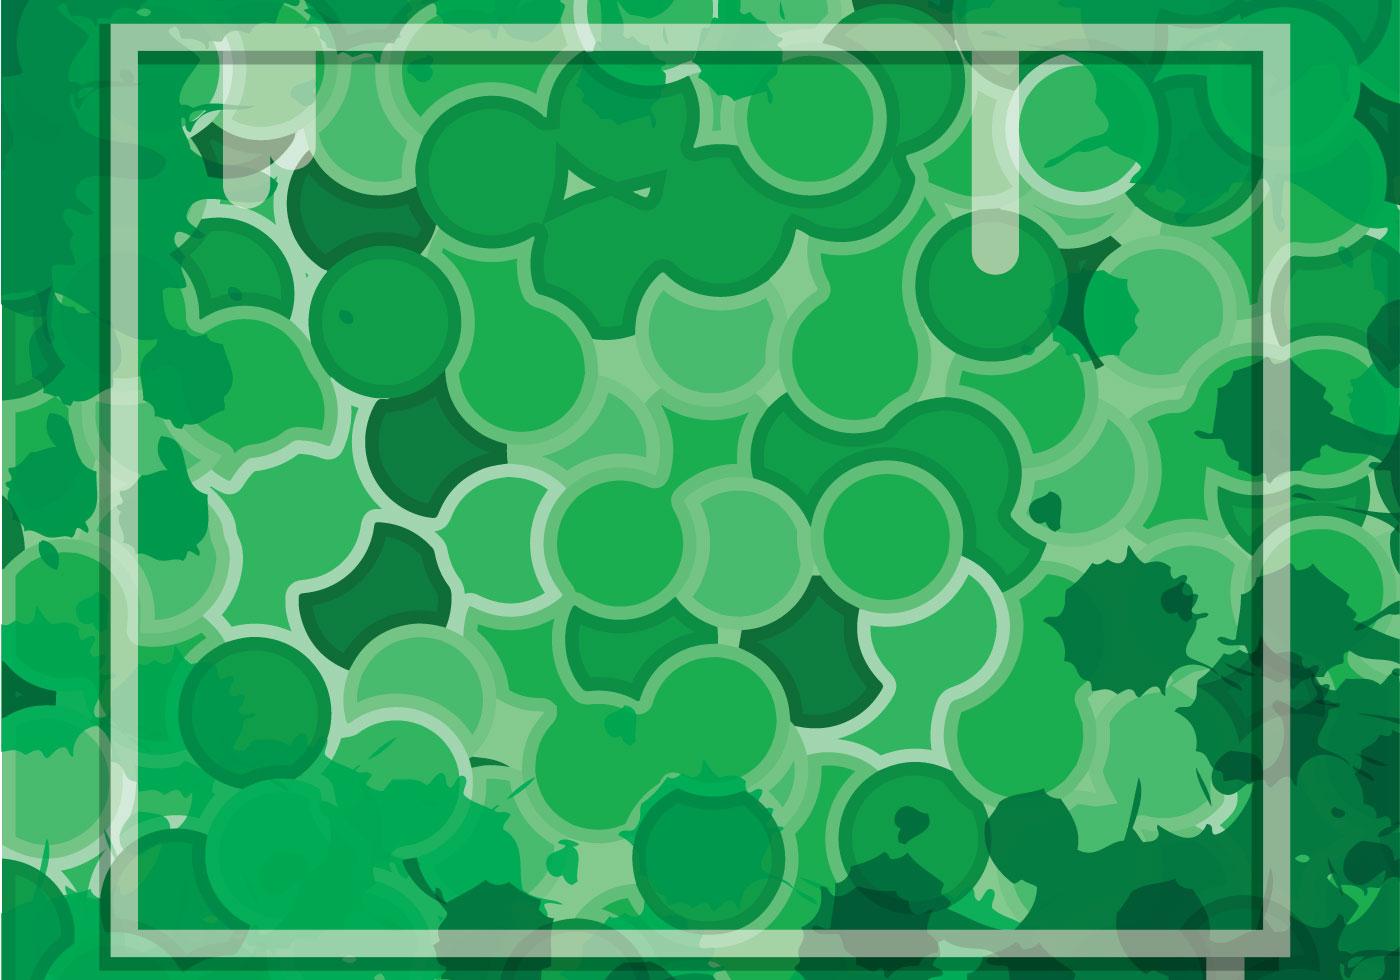 wallpaper amd hitam hijau - photo #13